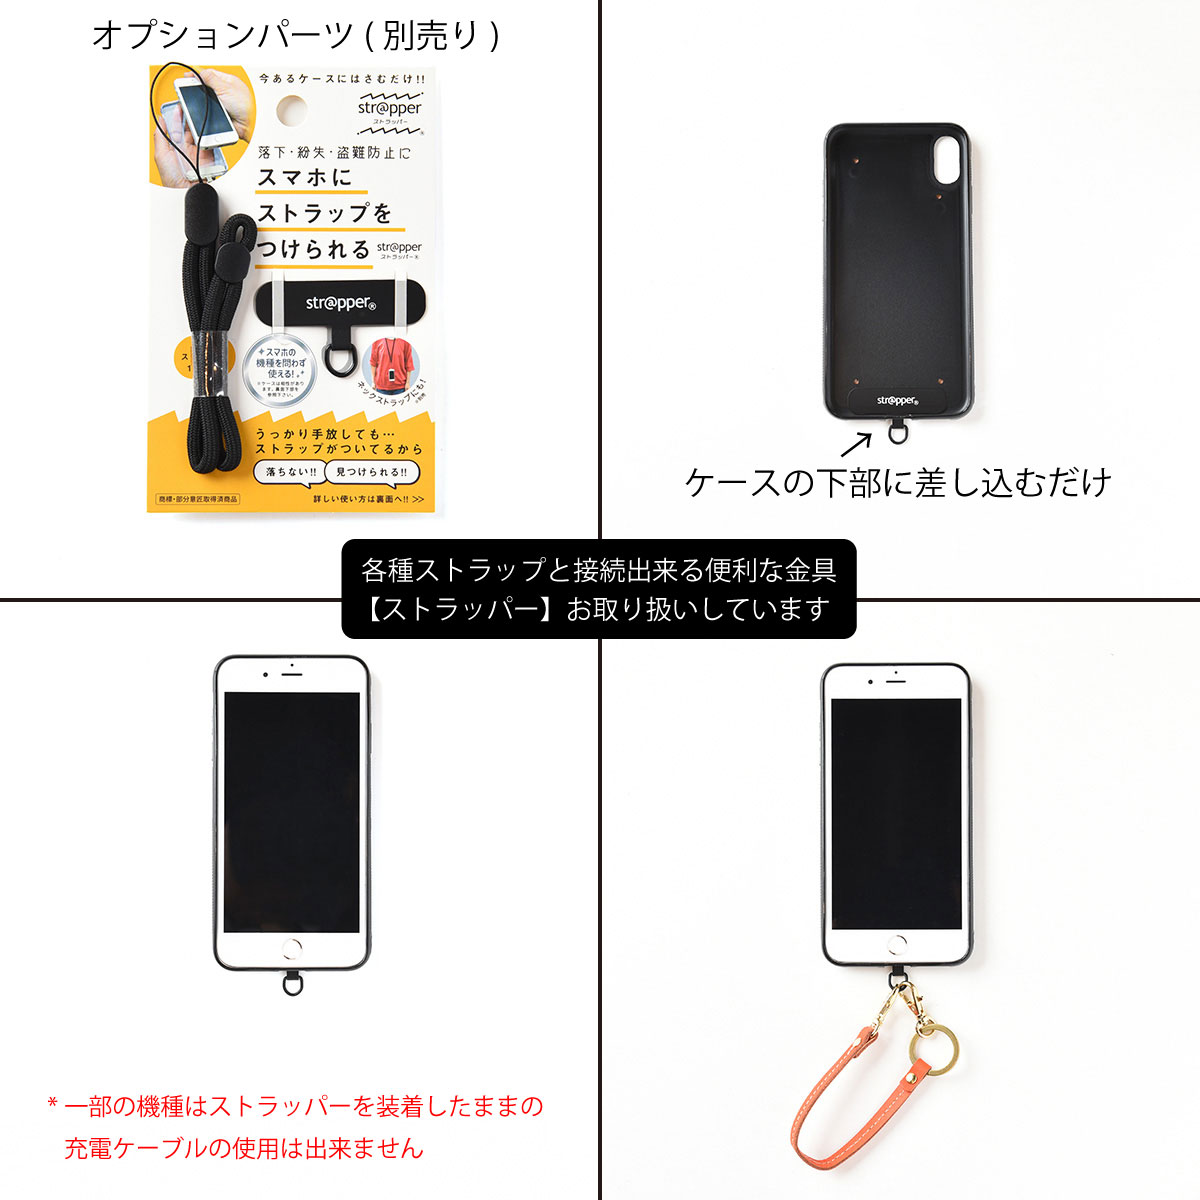 iPhoneOpenCase:   Design I:マーク埋込み/スマイル中央